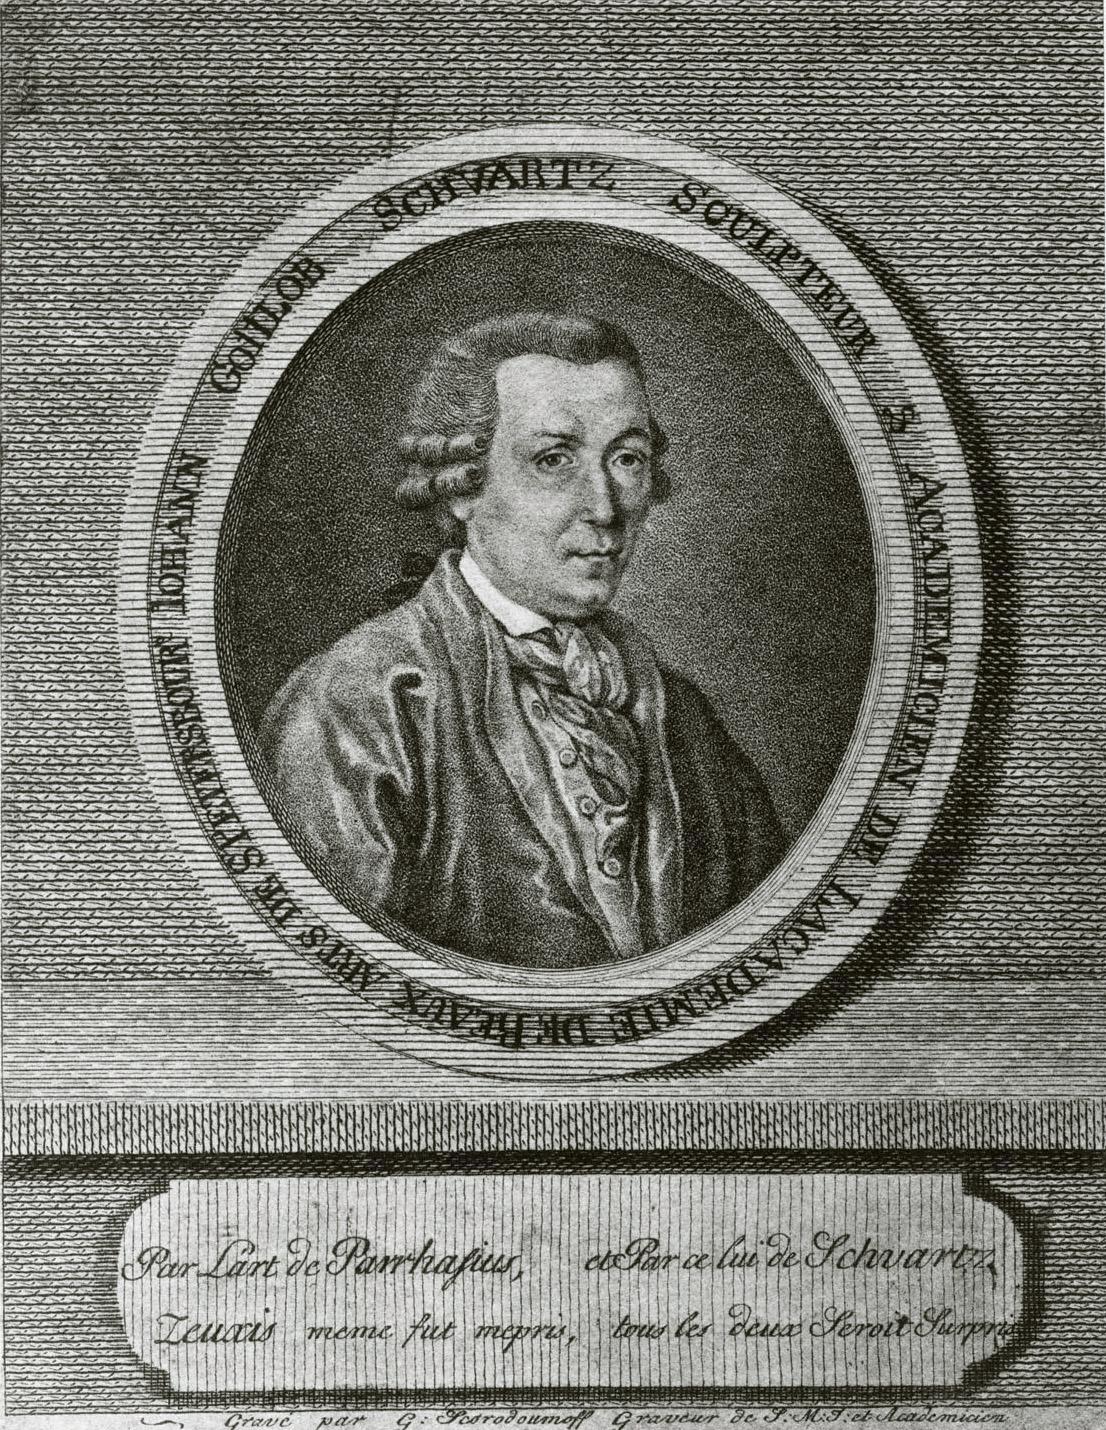 70. Иоганн Готлоб Шварц